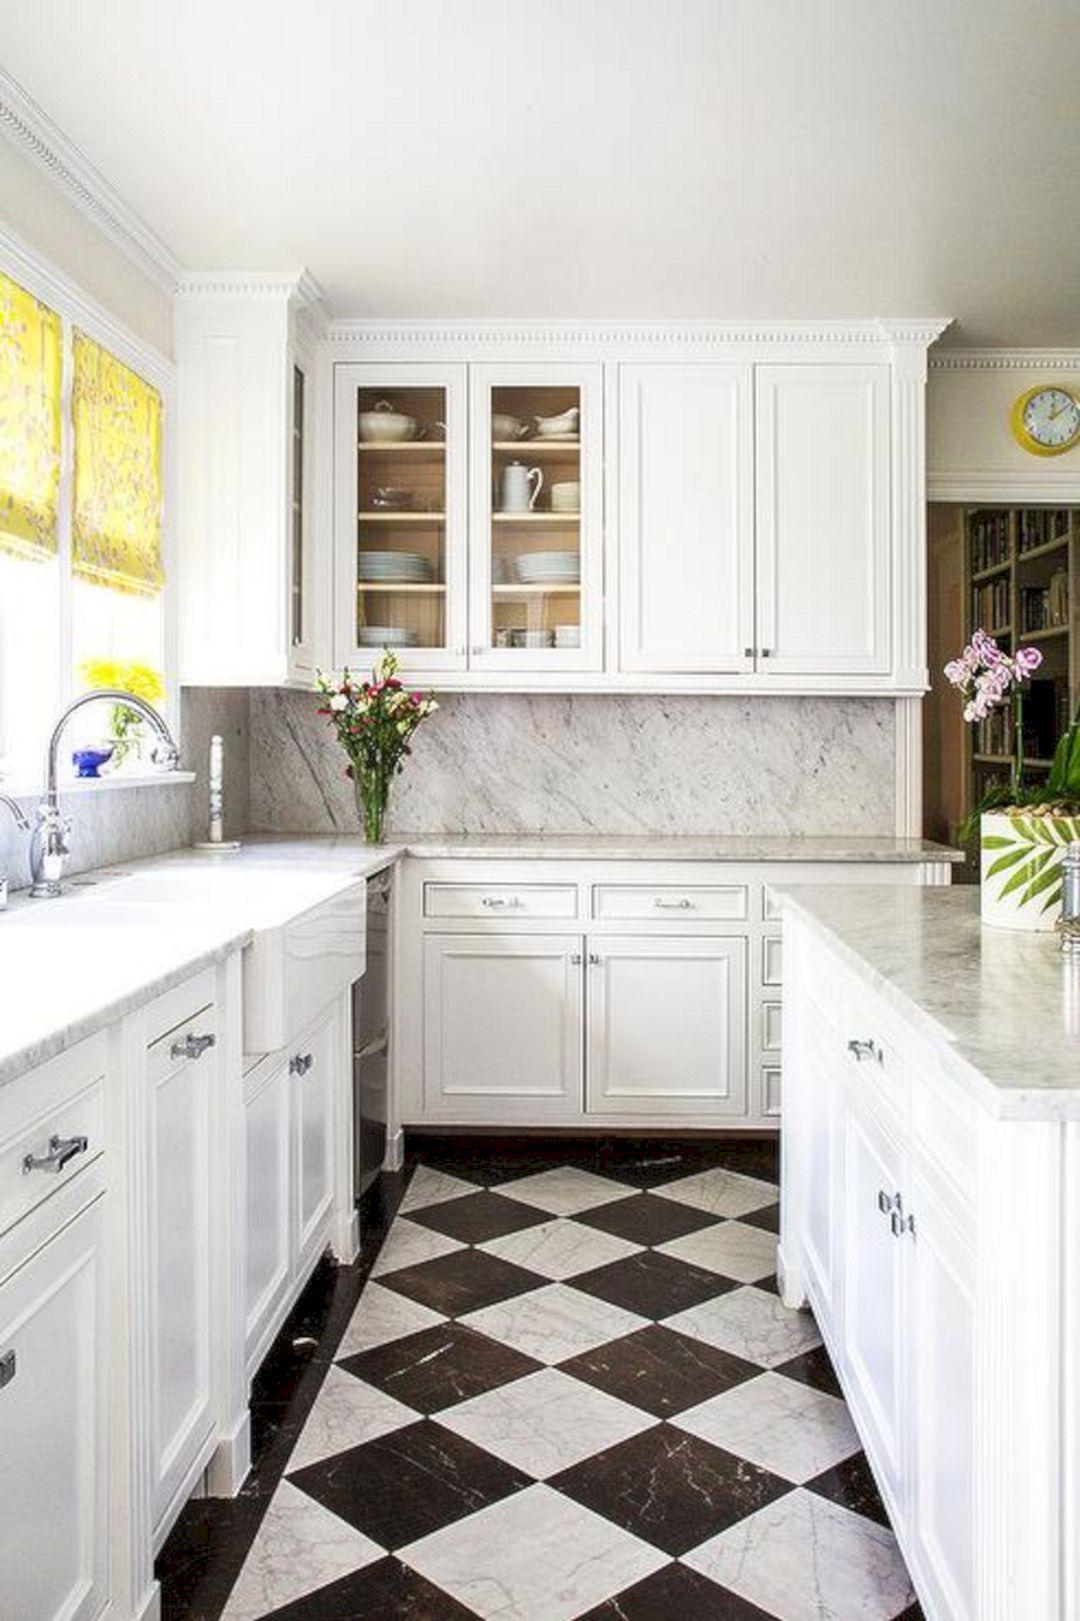 White Kitchen With Black Tile Floor   Novocom.top